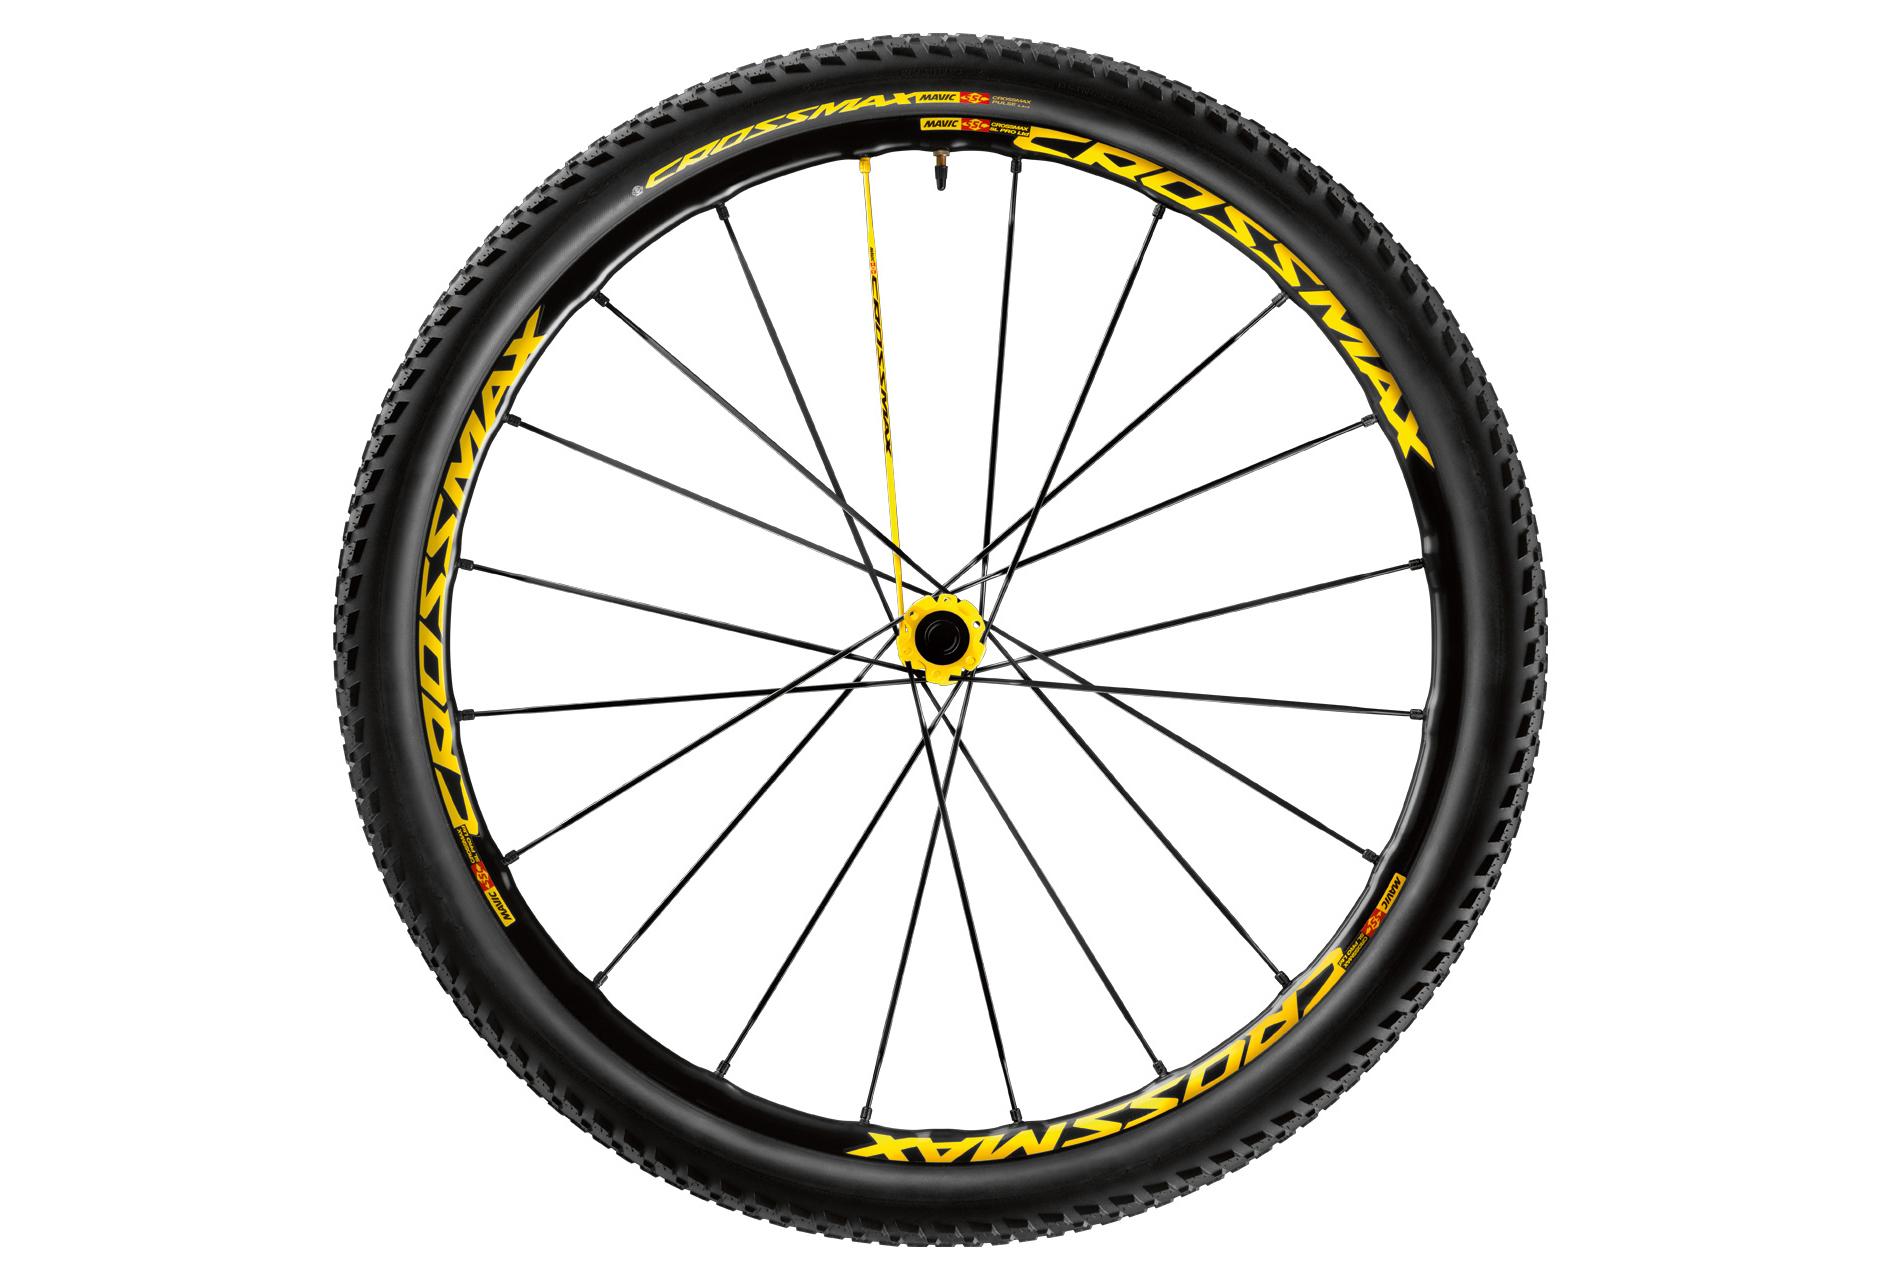 Mavic Crossmax Sl Rear Wheel Ltd Pro 27 5 6tr 12x135mm Offset Cannondale Tire